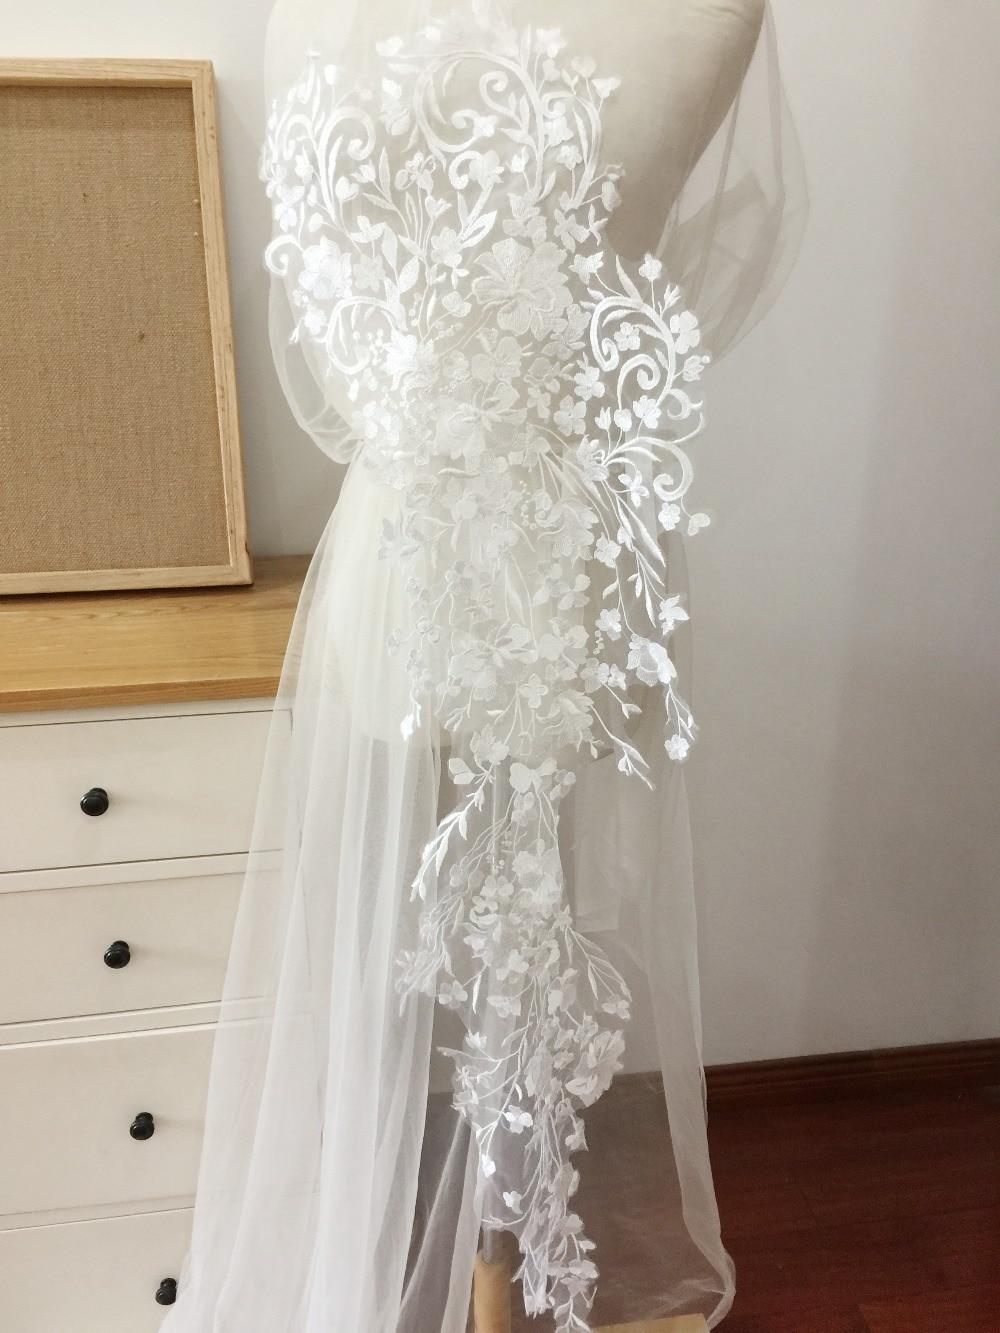 Bridal Dress Lace Applique Off White Floral Trim Embroidered Wedding Motif 1 PC